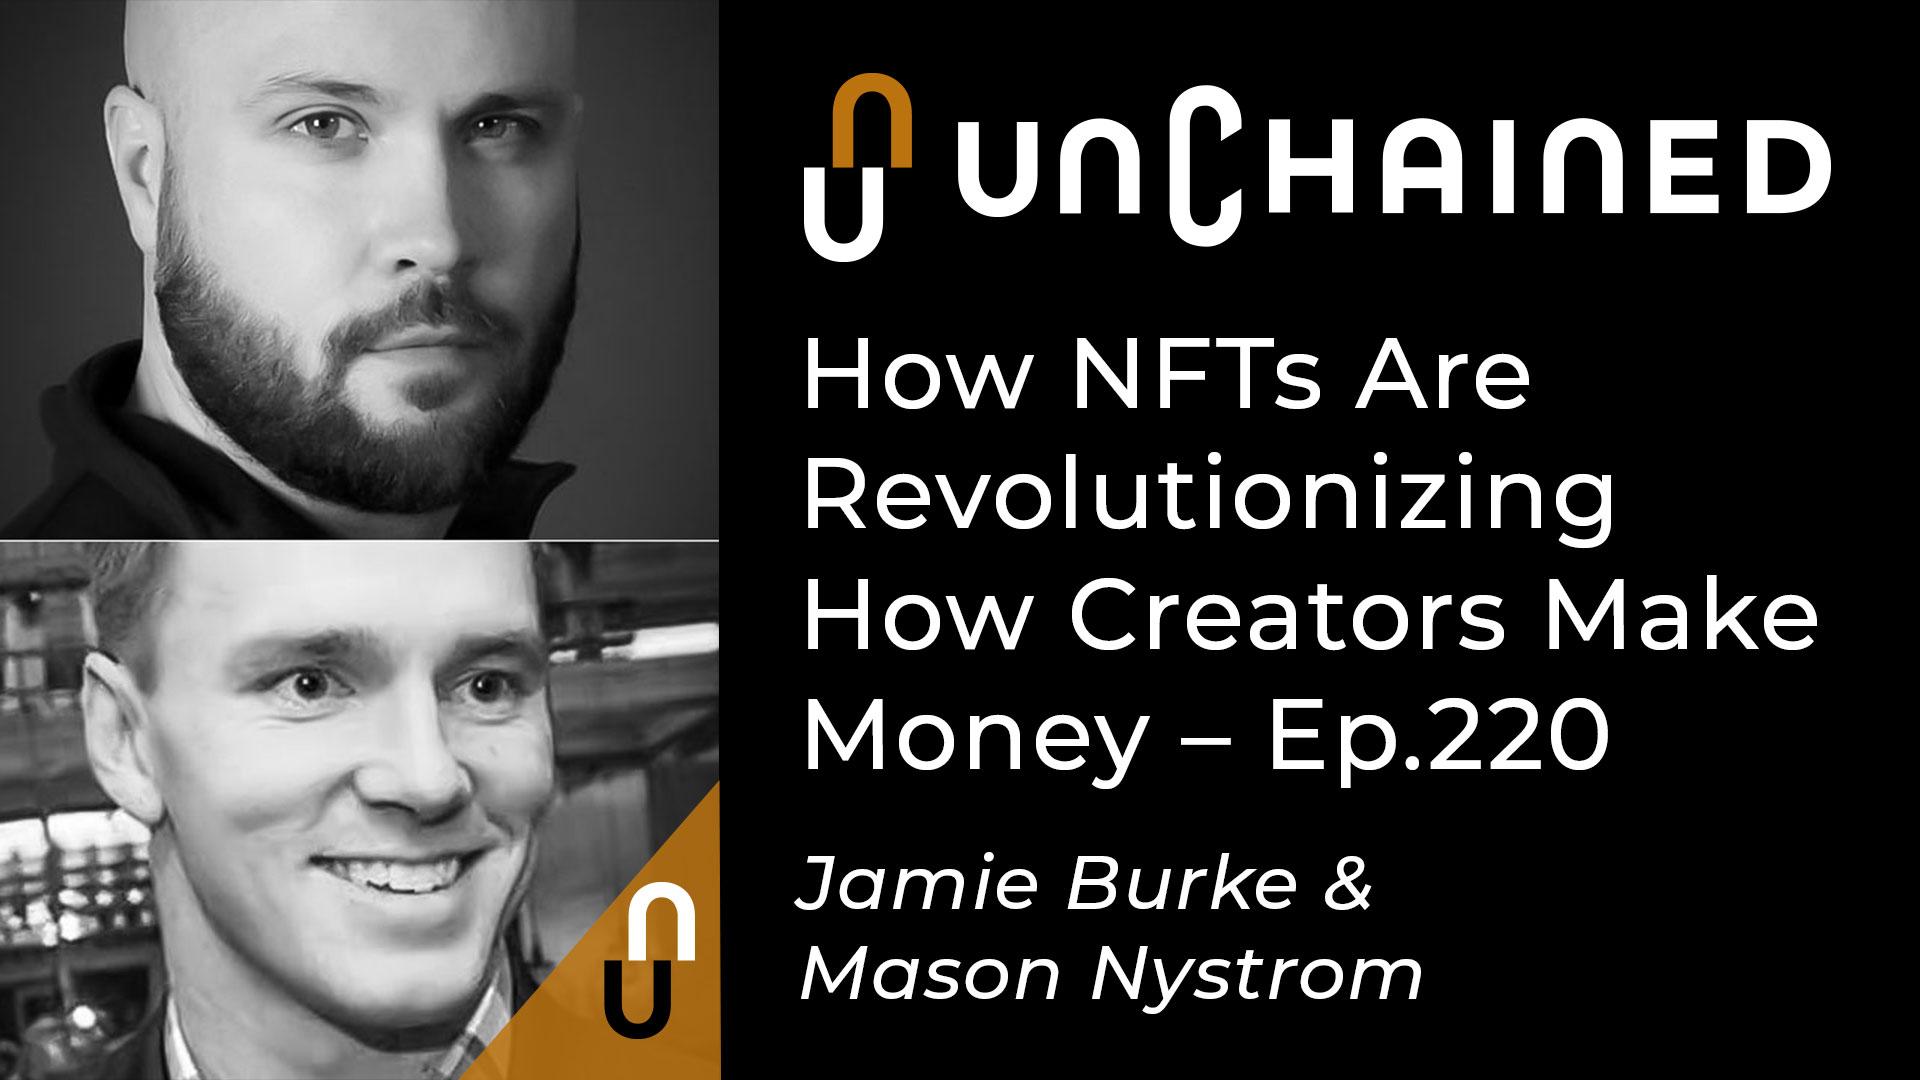 How NFTs Are Revolutionizing How Creators Make Money